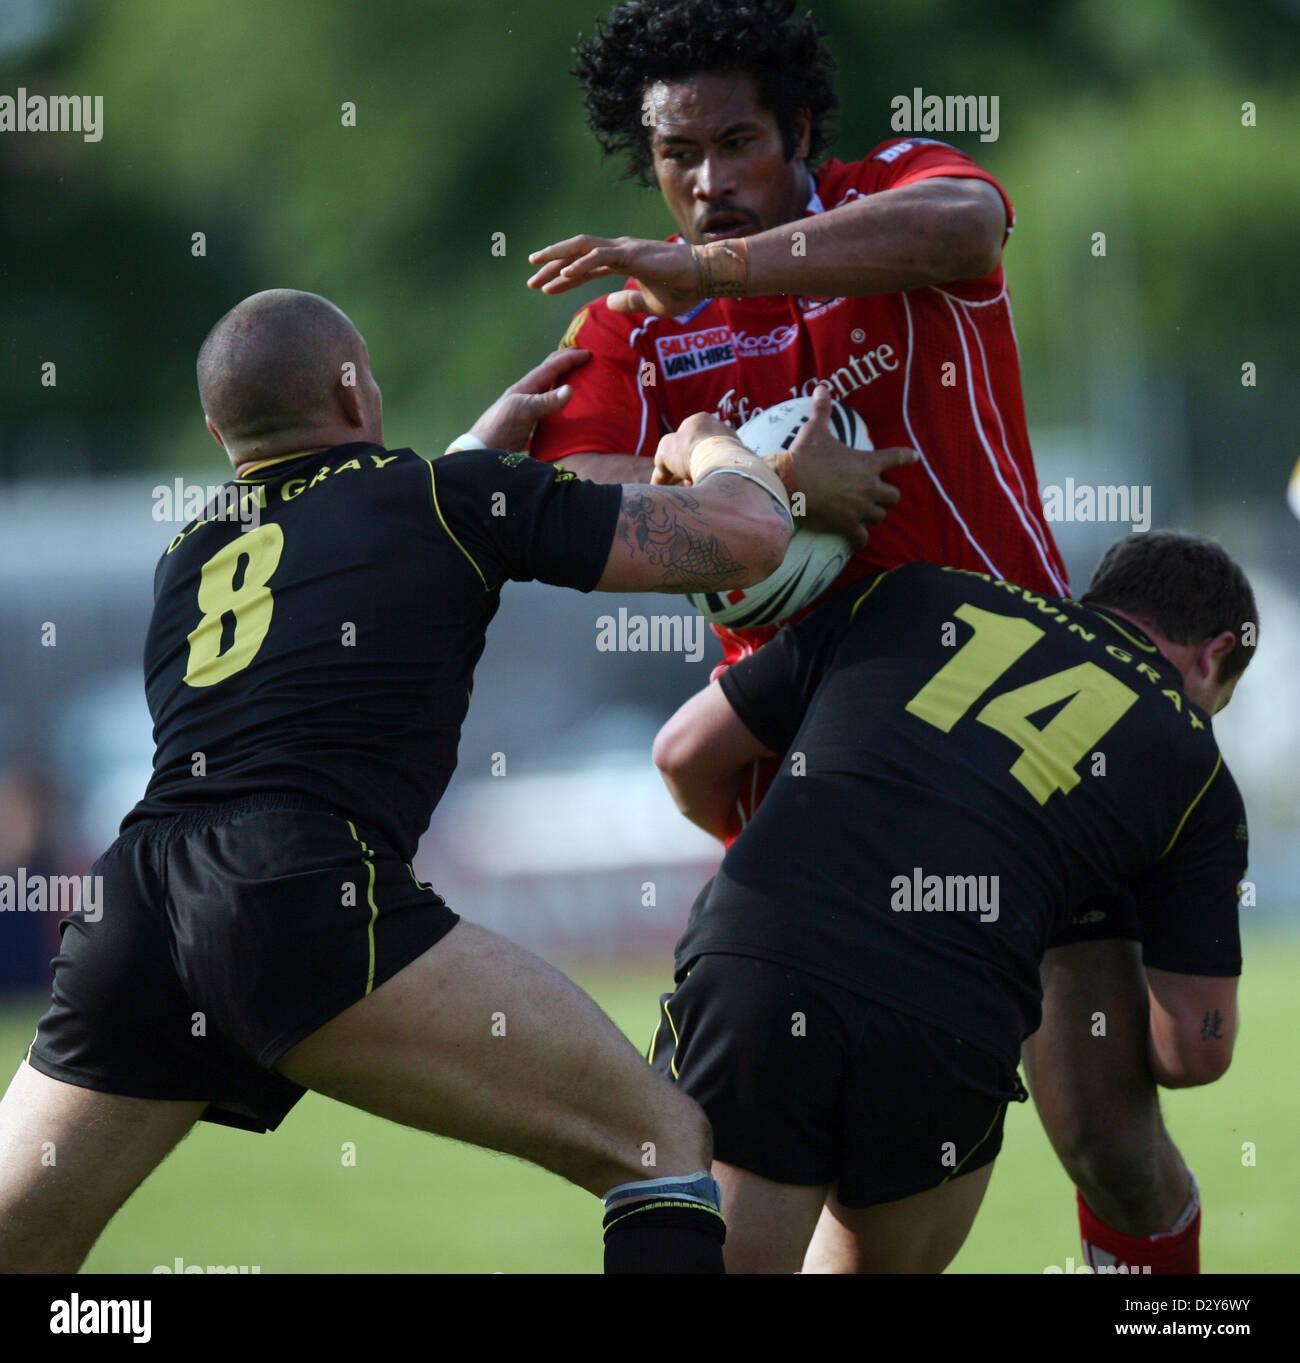 Celtic Crusaders v Salford City Reds. Reds' Phil Leuluai tries to get past tacklers Crusaders' Jordan James - Stock Image